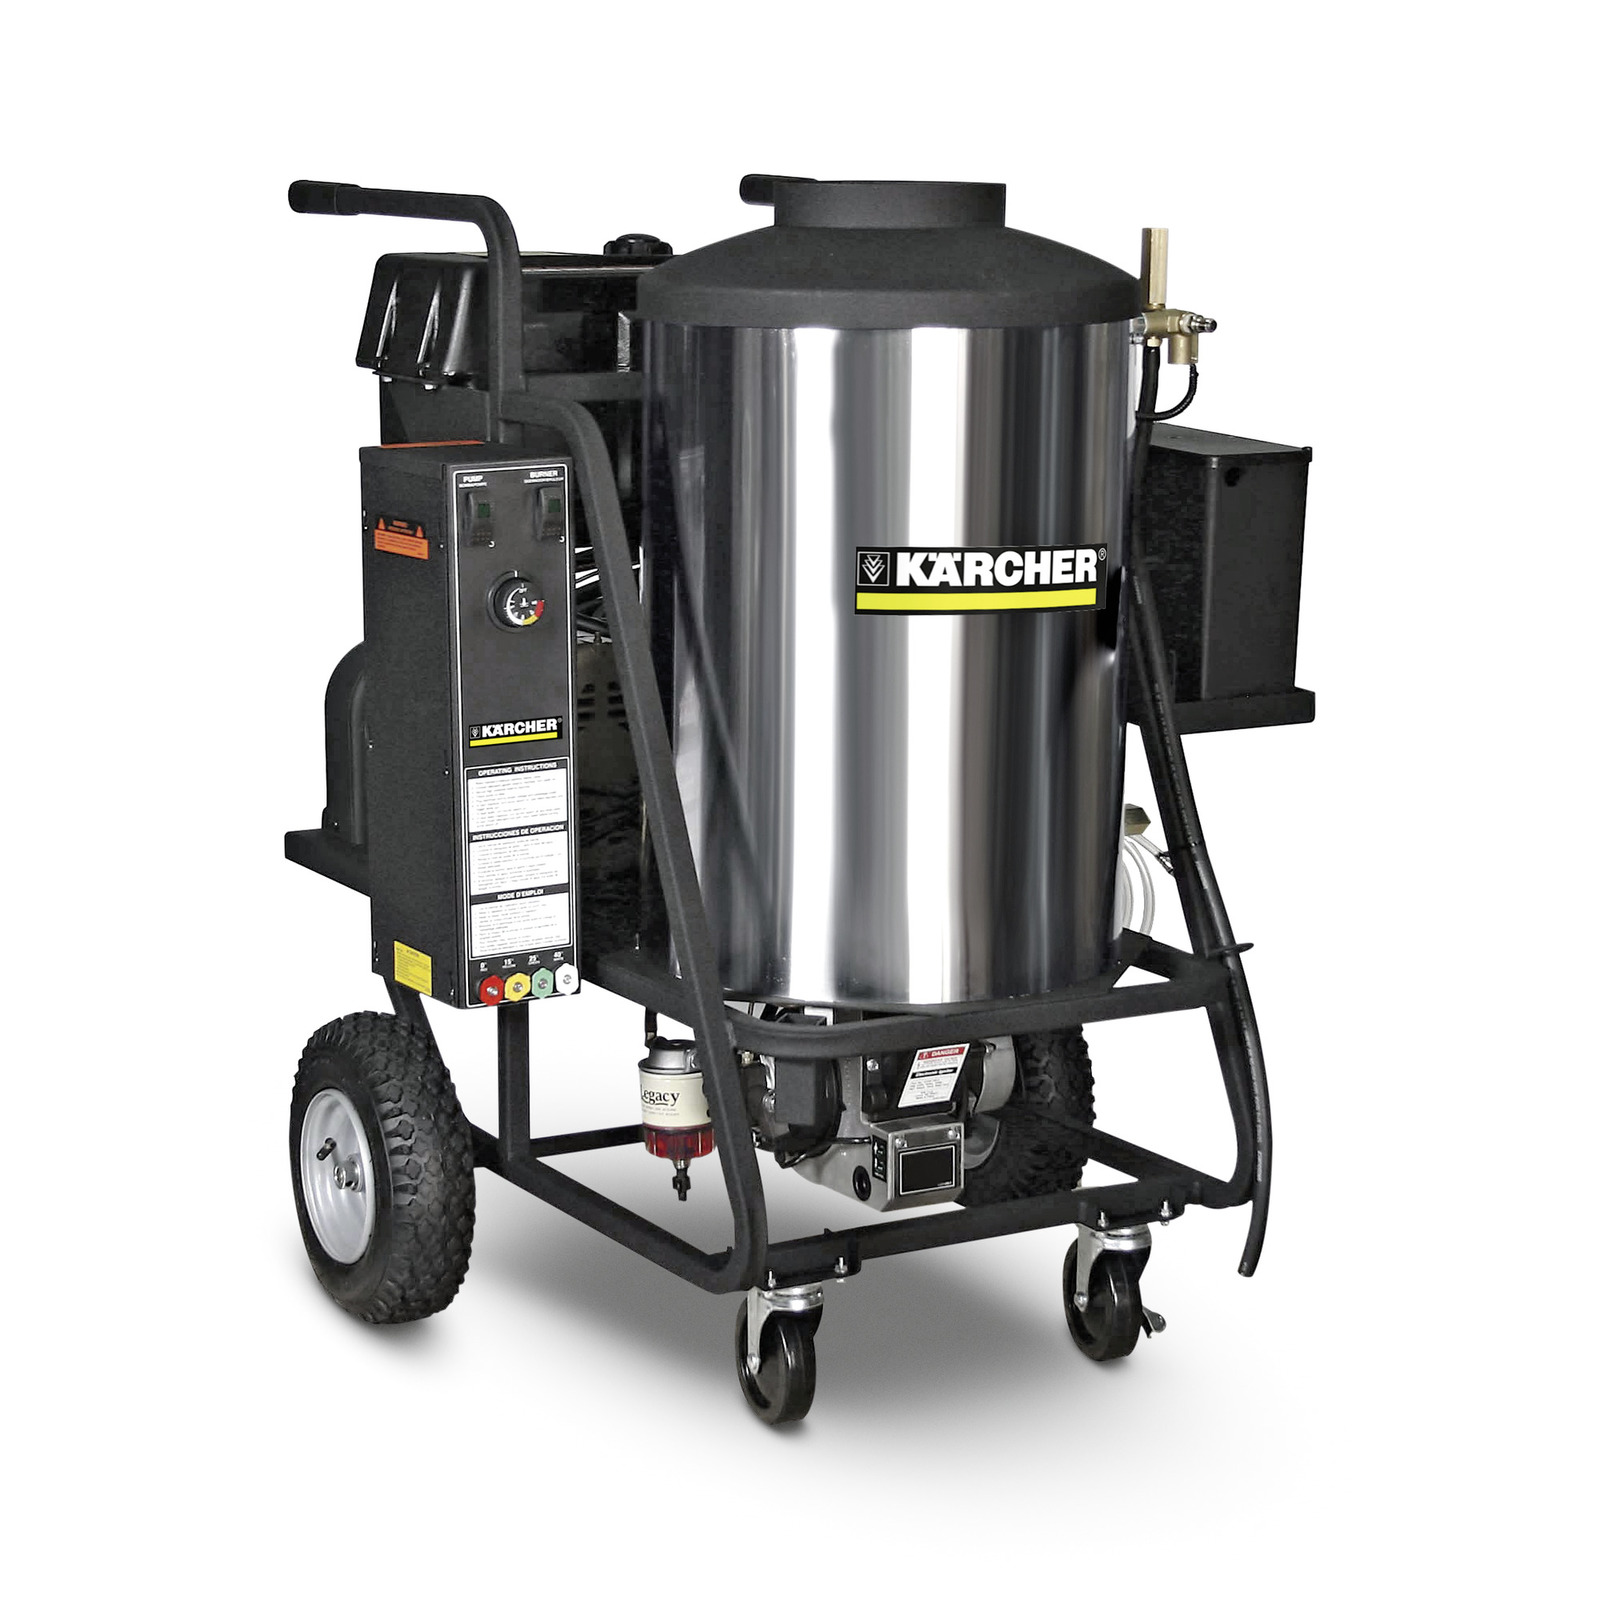 Nettoyeur haute pression hds 3 5 30 ec k rcher canada - Nettoyeur haute pression karcher gamme pro ...